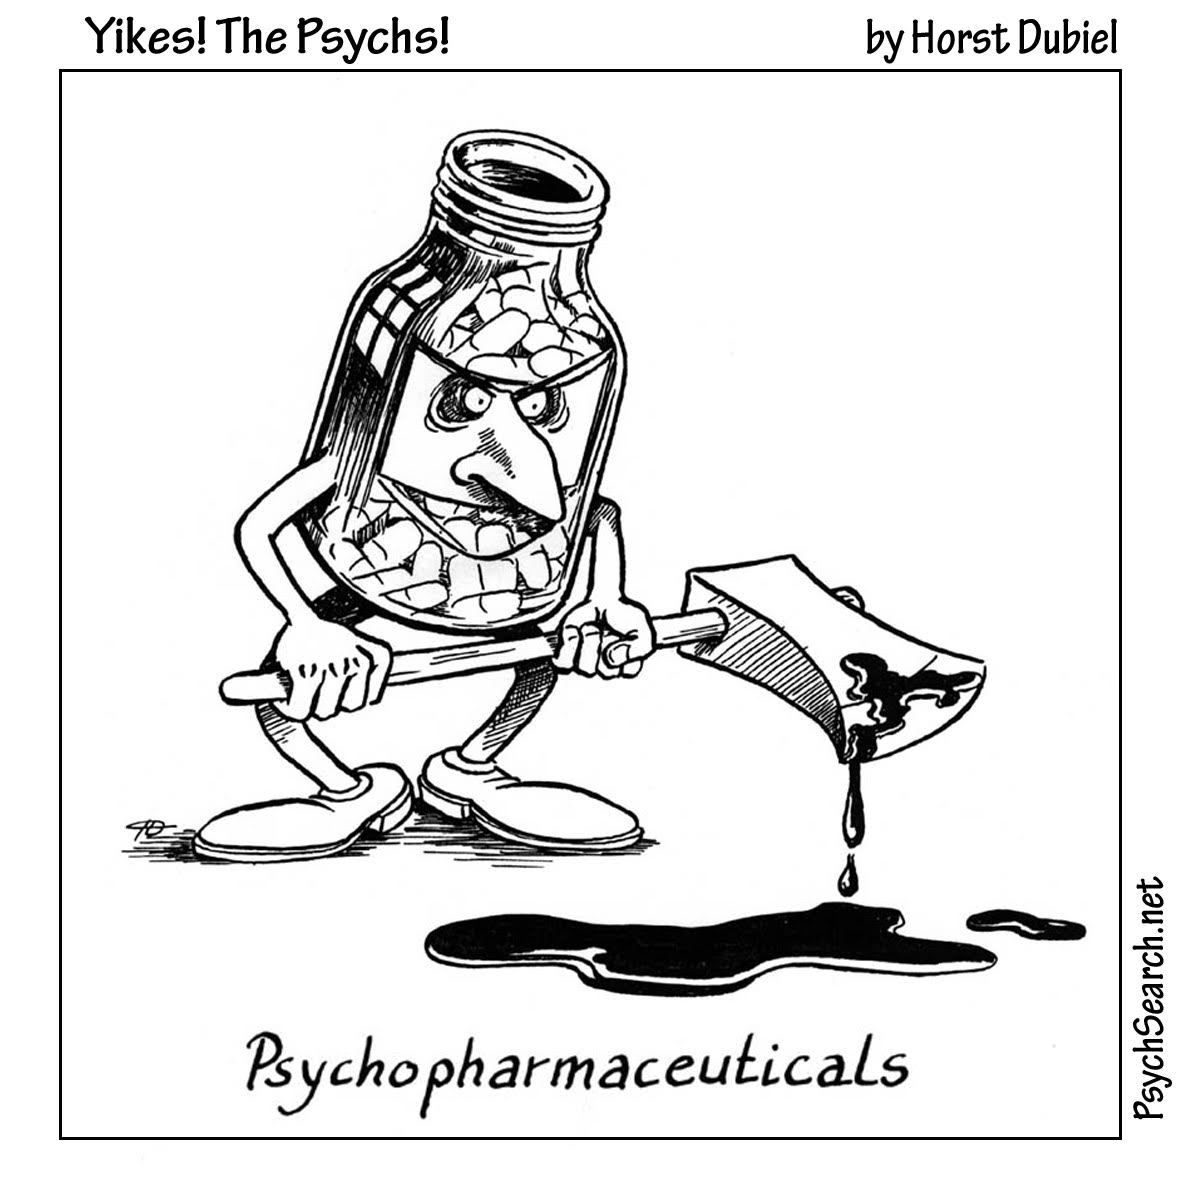 Psychopharmaceuticals